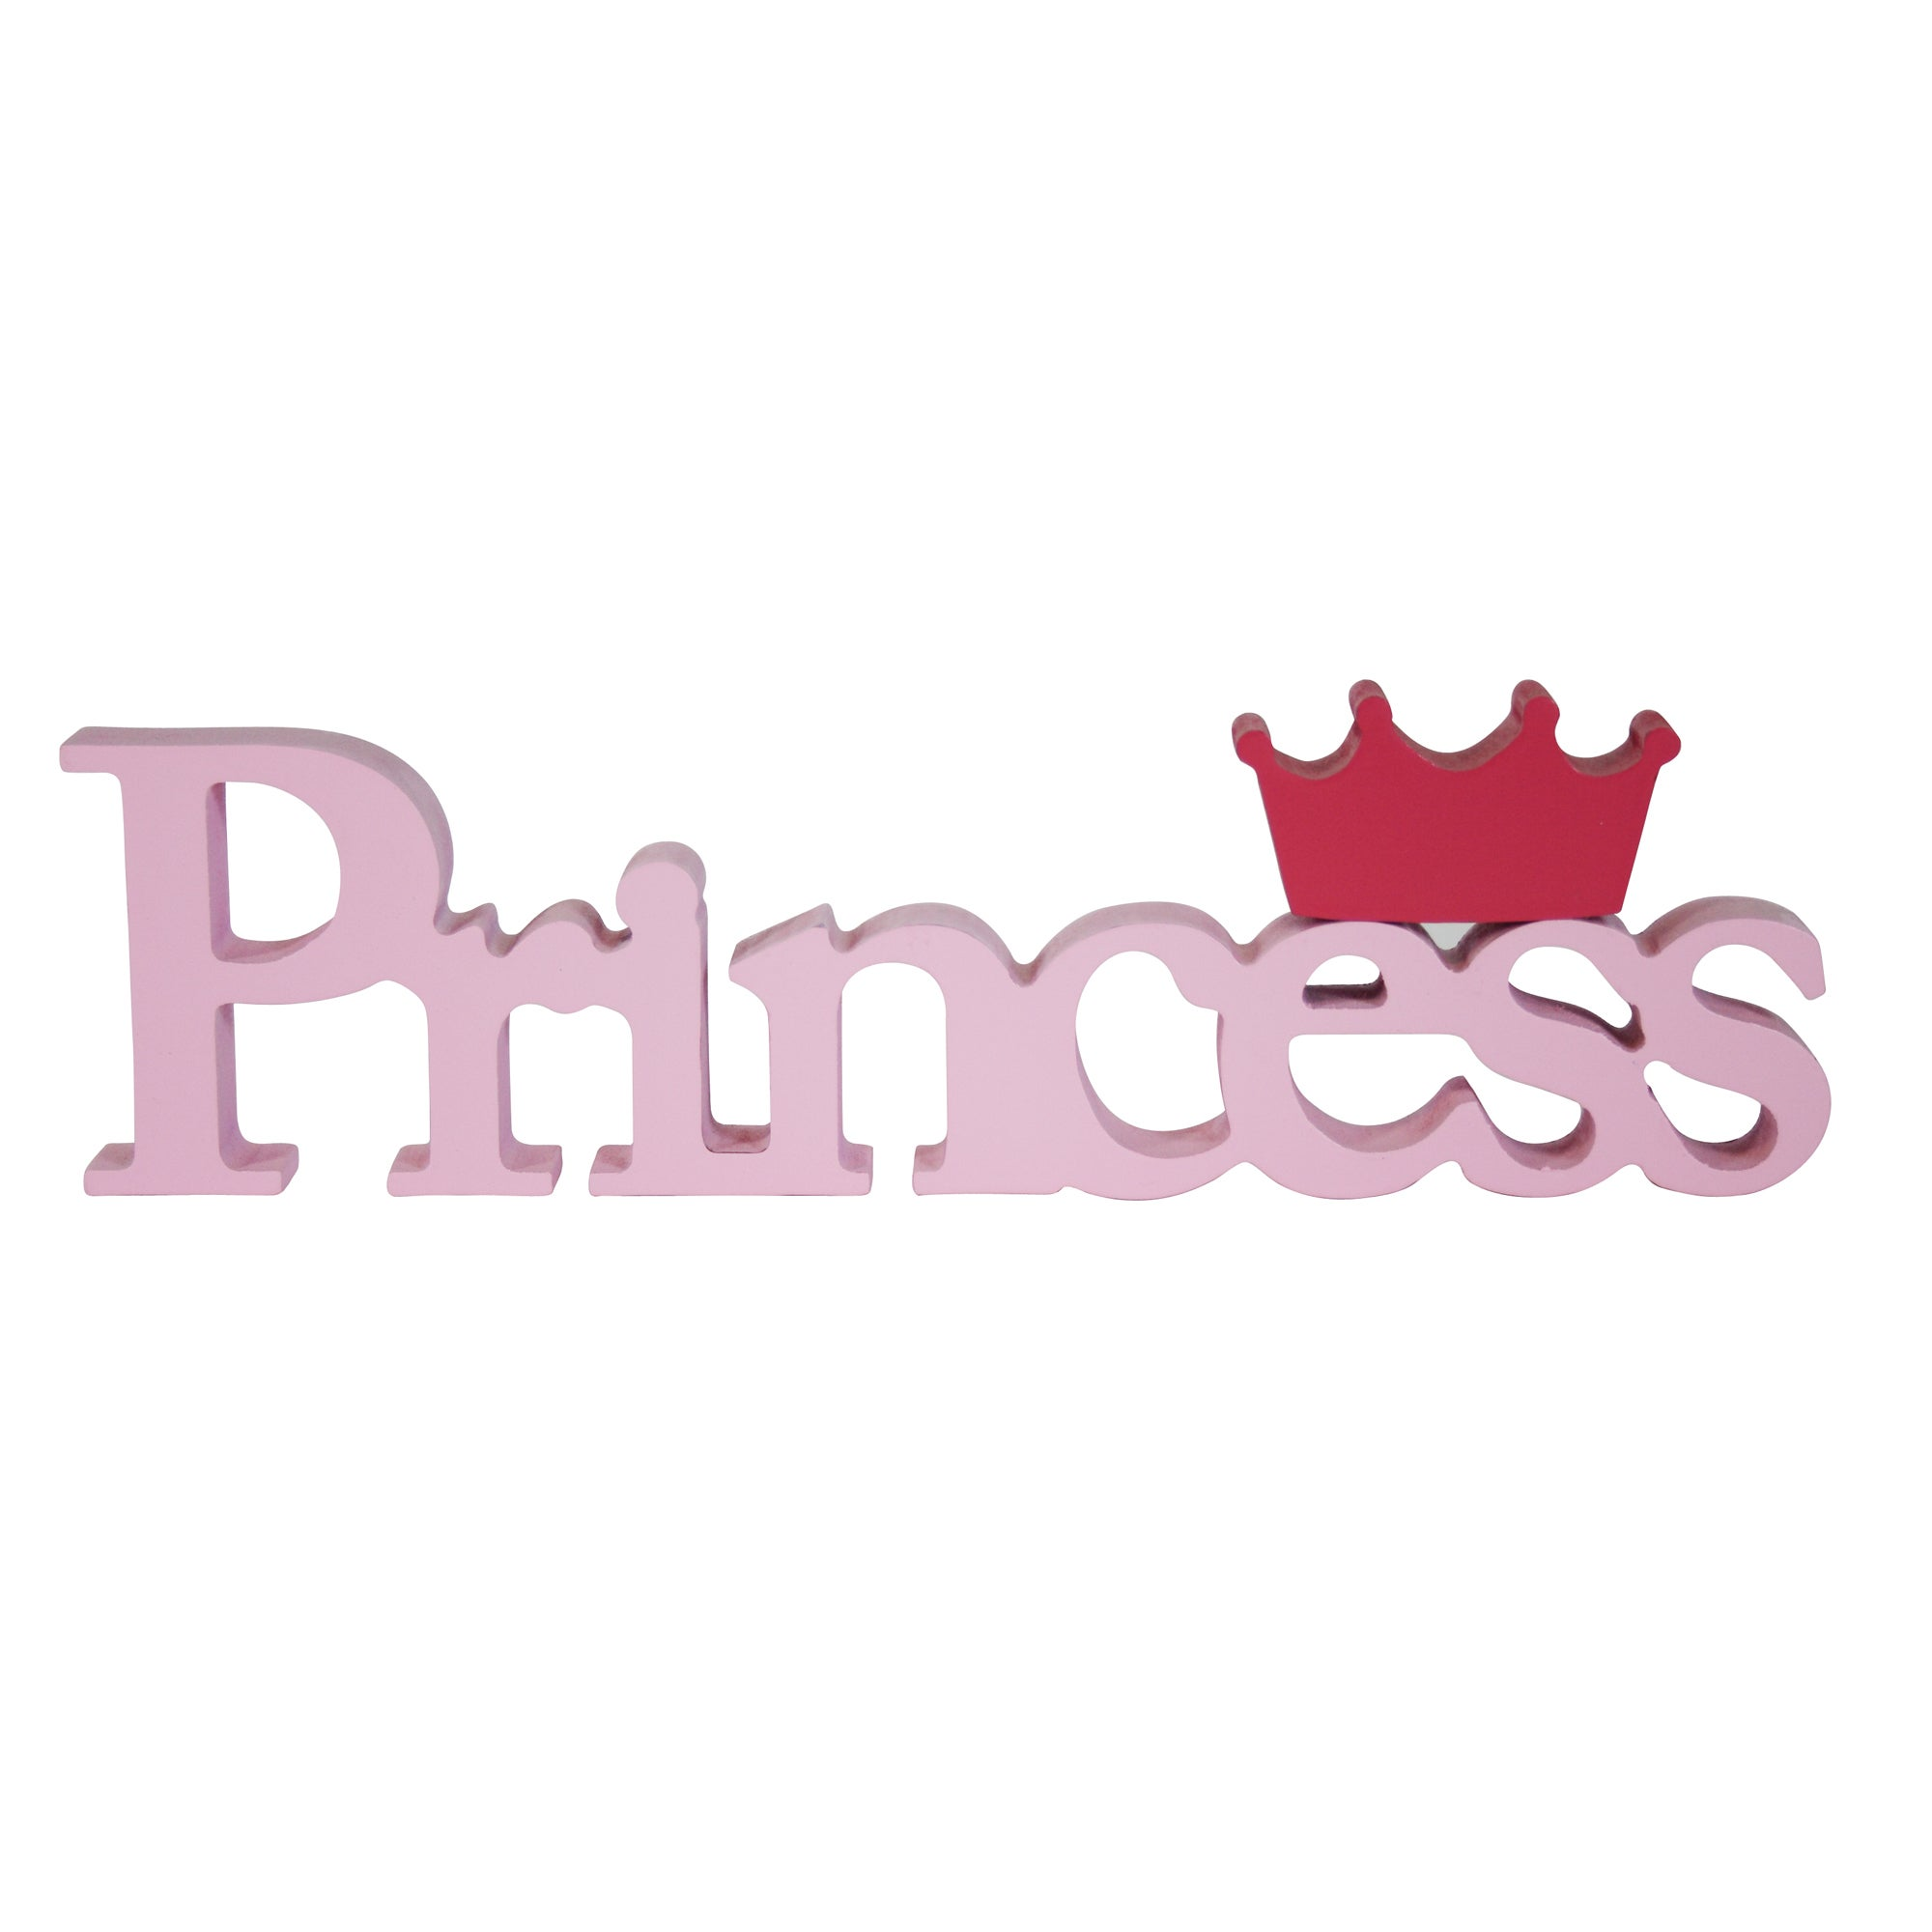 Kids Princess Word Ornament